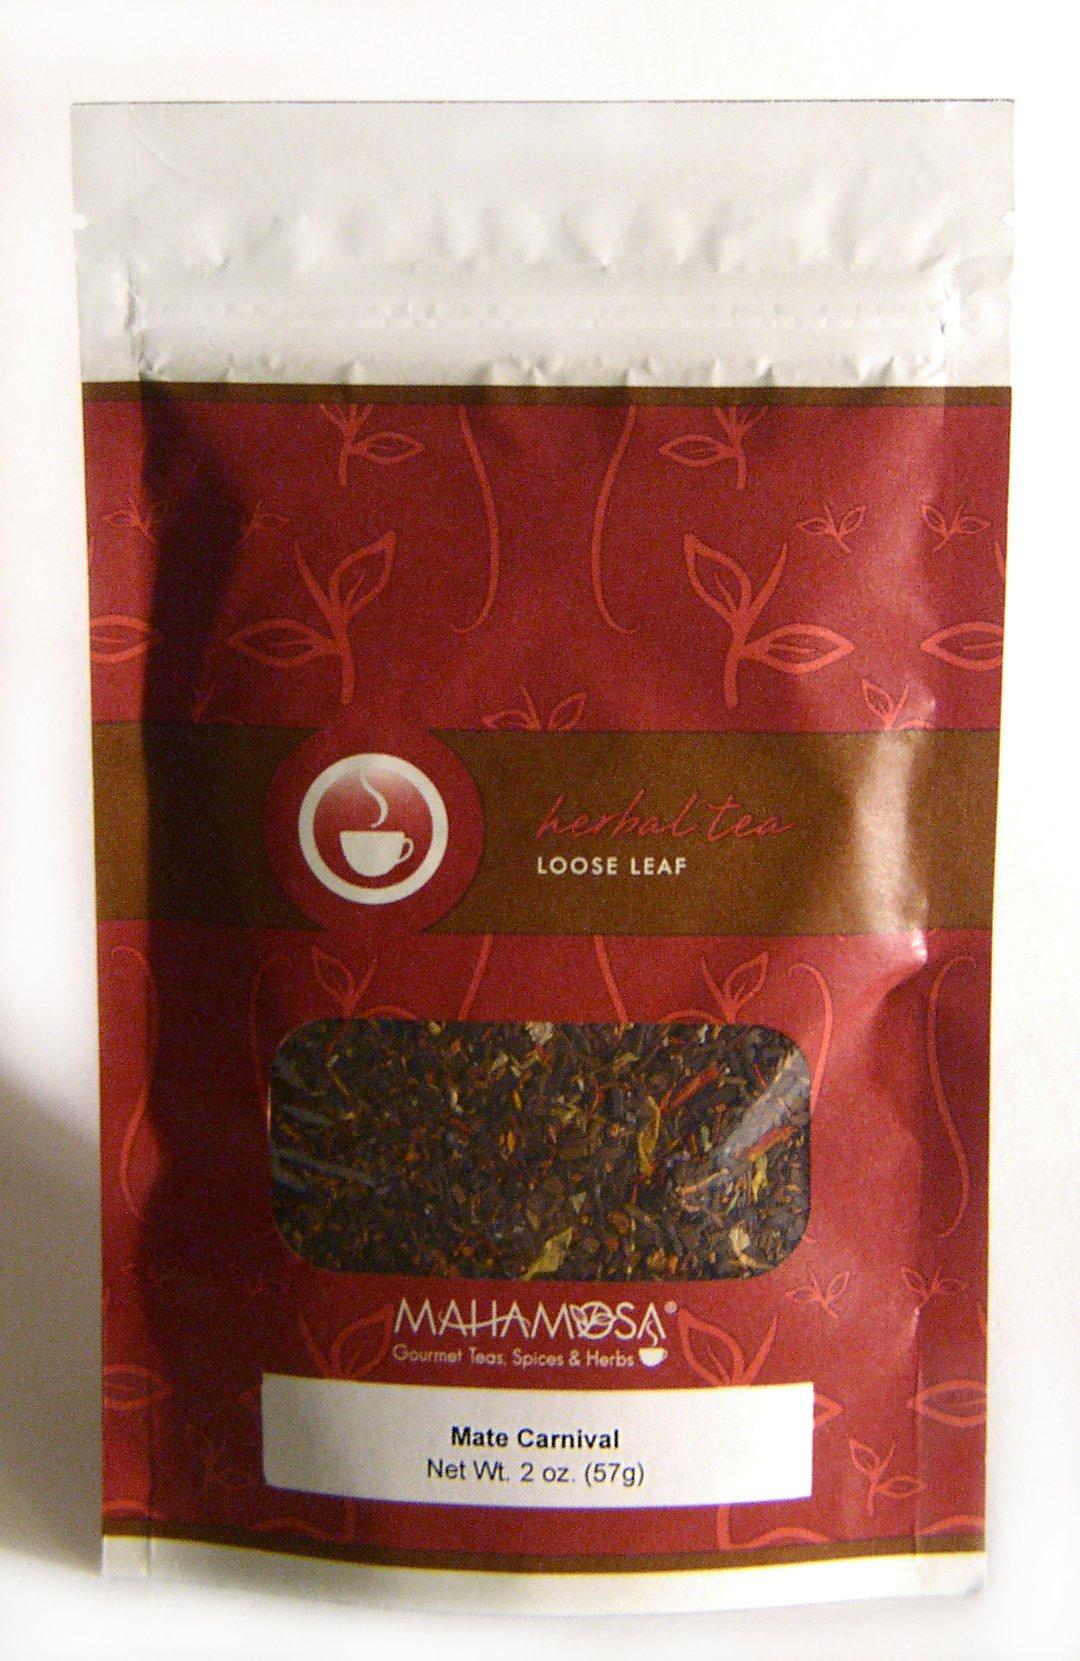 Mahamosa Yerba Mate (Coffee Flavor) Herbal Tea Blend Looseleaf (Loose Leaf) - Mate Carnival 2 oz by Mahamosa Gourmet Teas, Spices & Herbs